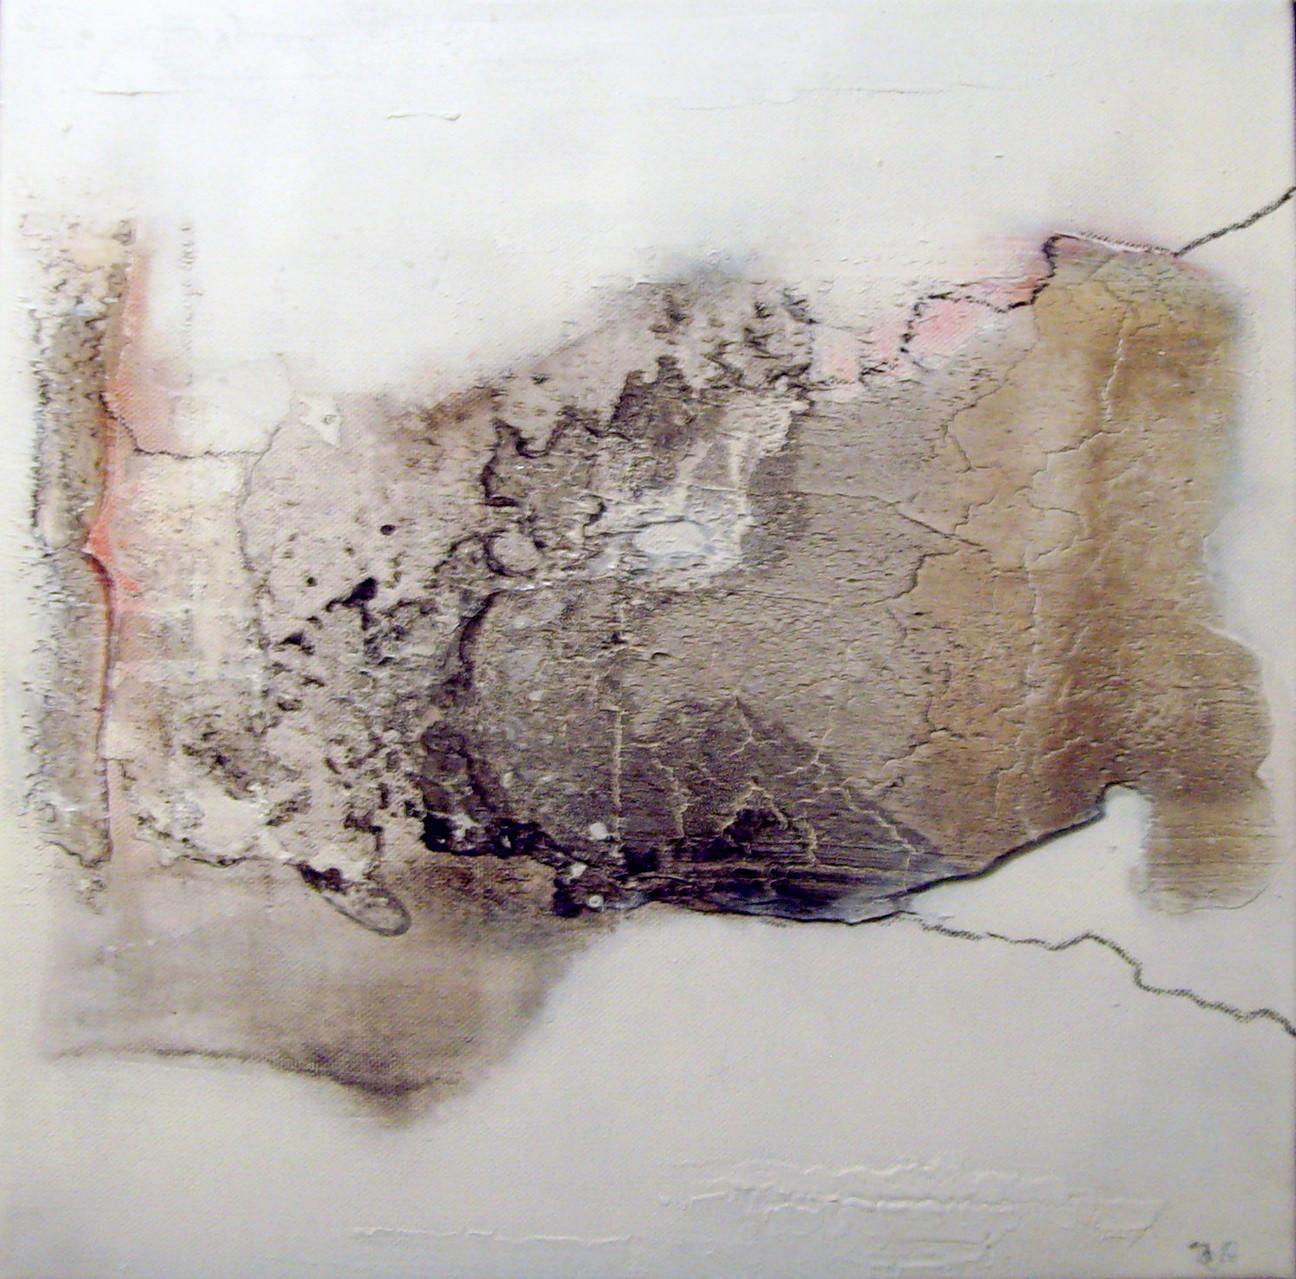 N°12 - 40cm x 40cm, Materialmix auf Leinwand